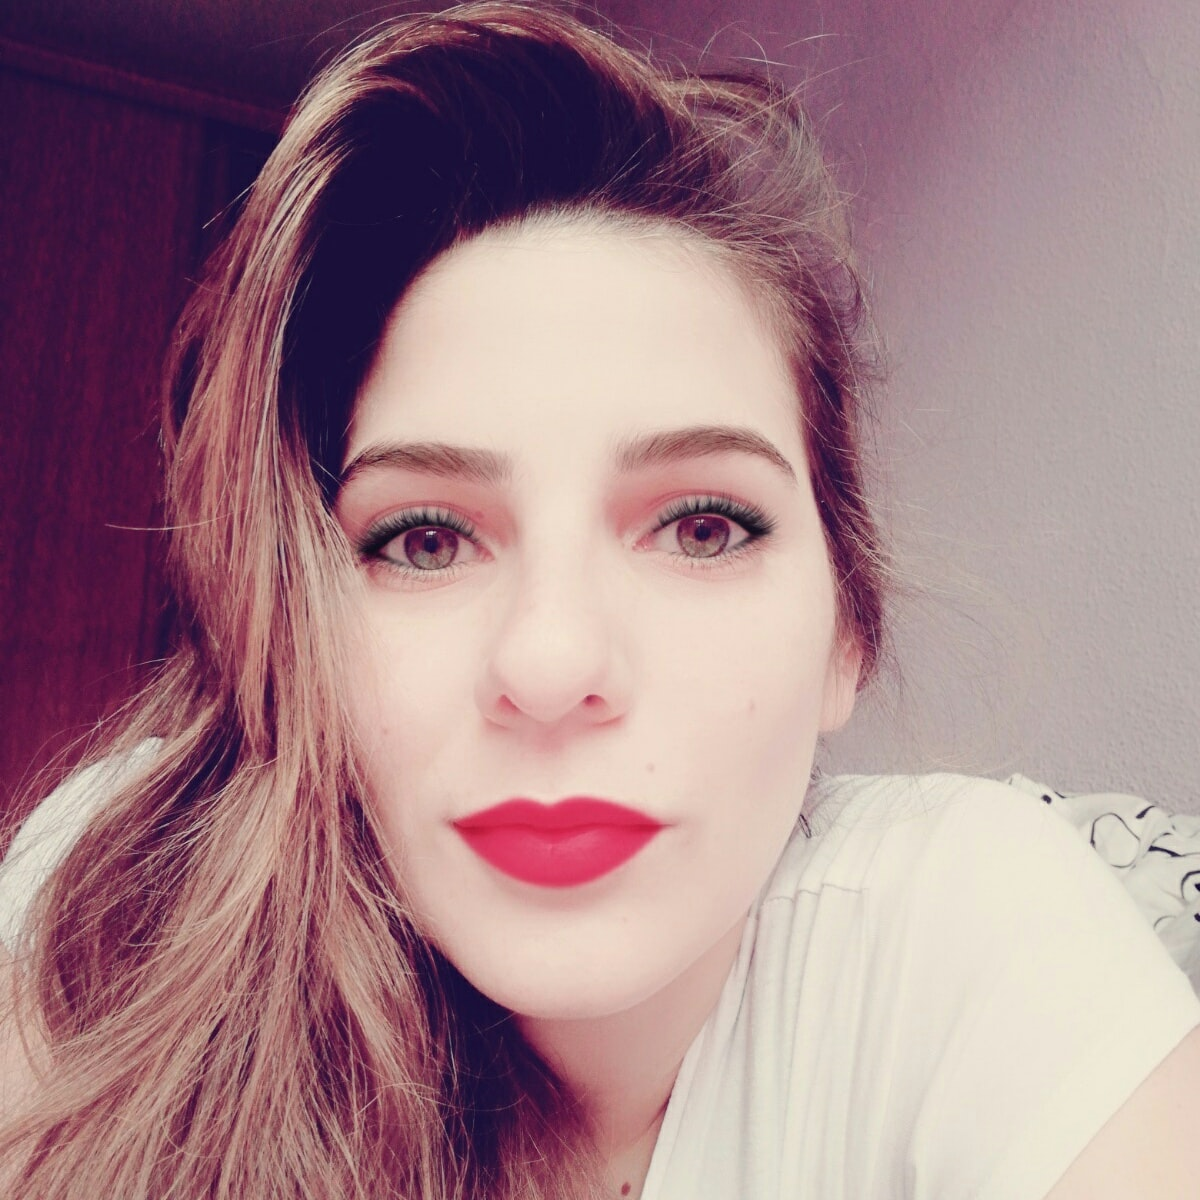 Go to Dhana Corredor's profile